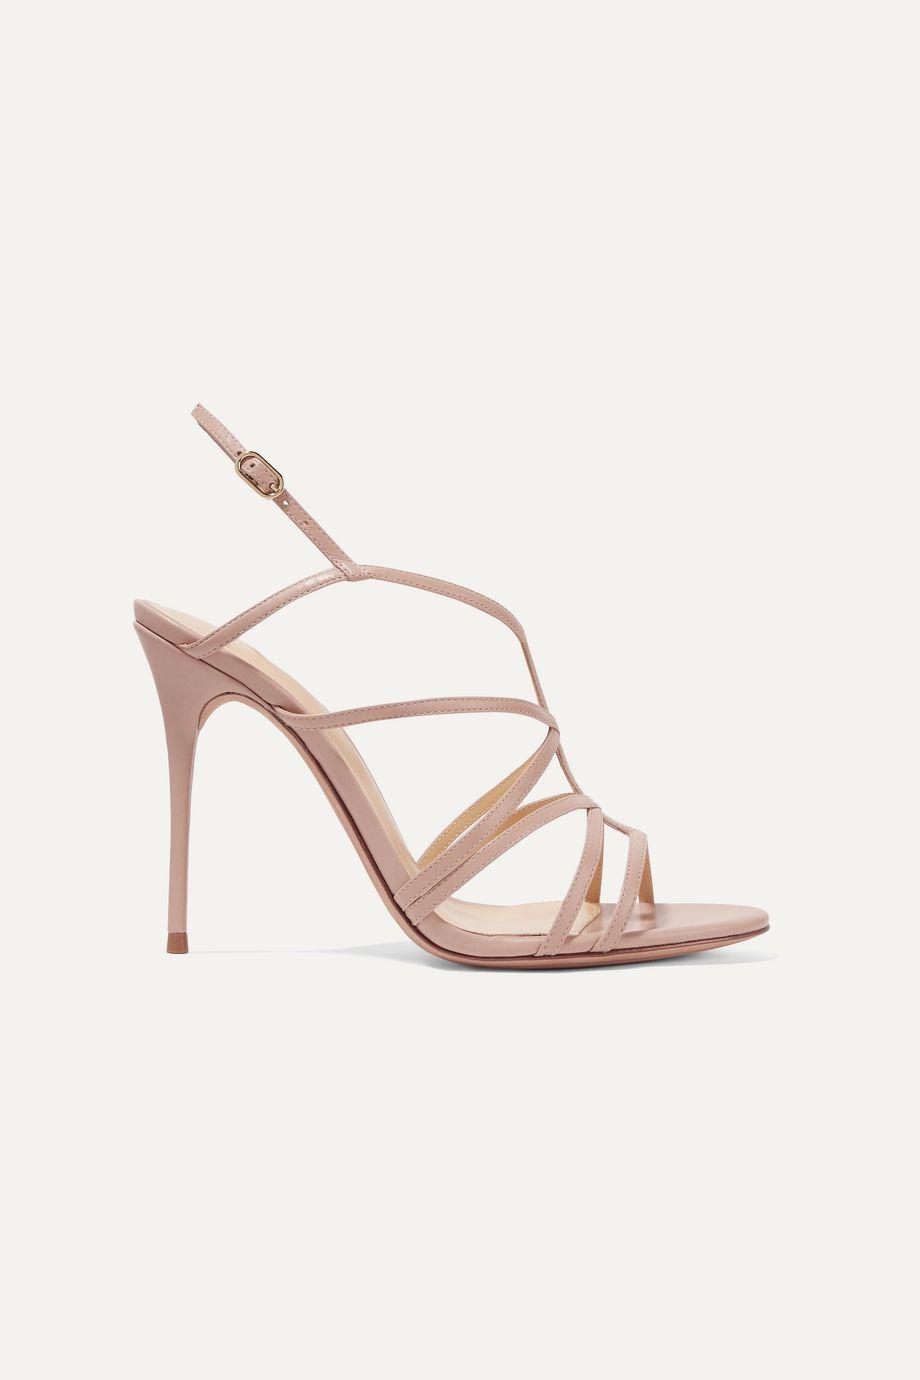 Alexandre Birman Emma Cage leather sandals